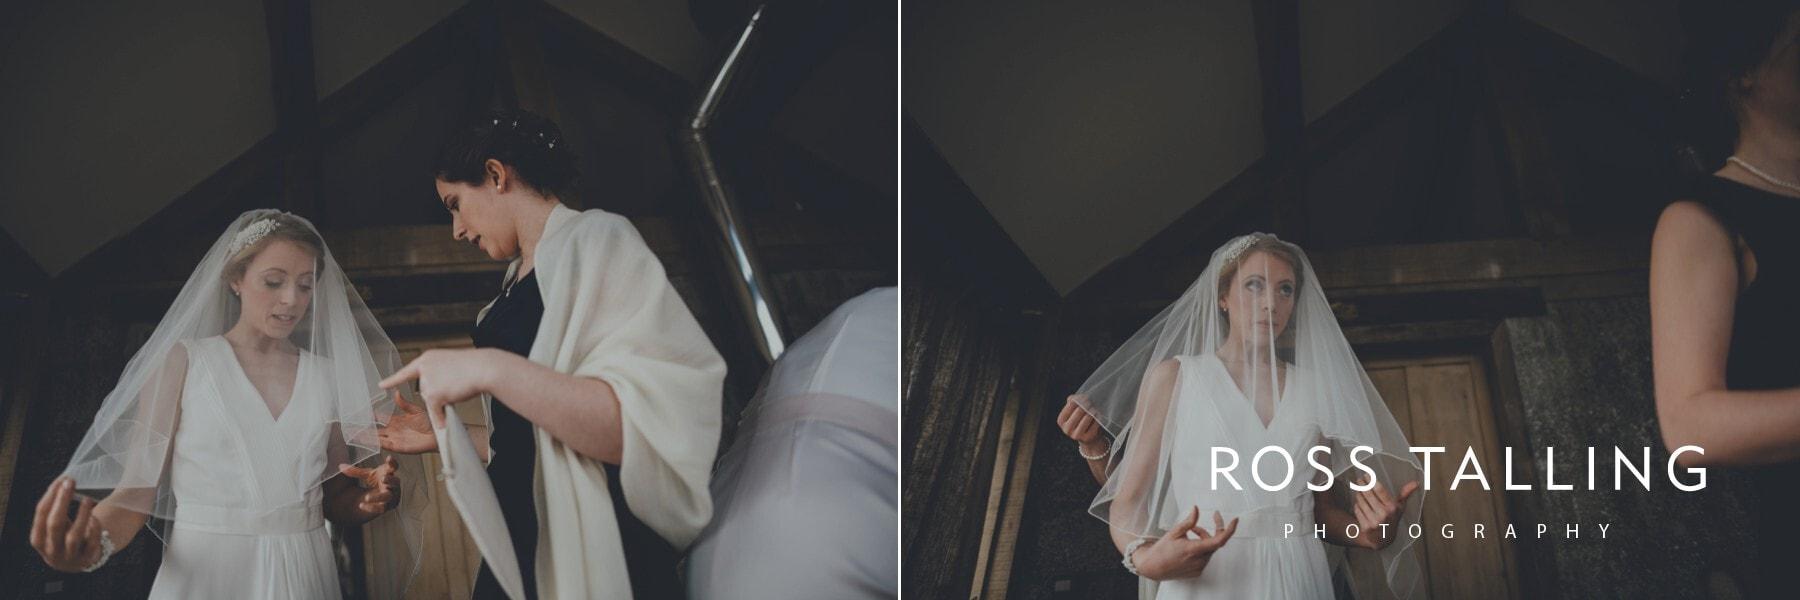 Bonnie & James Wedding Photography Cornwall_0037